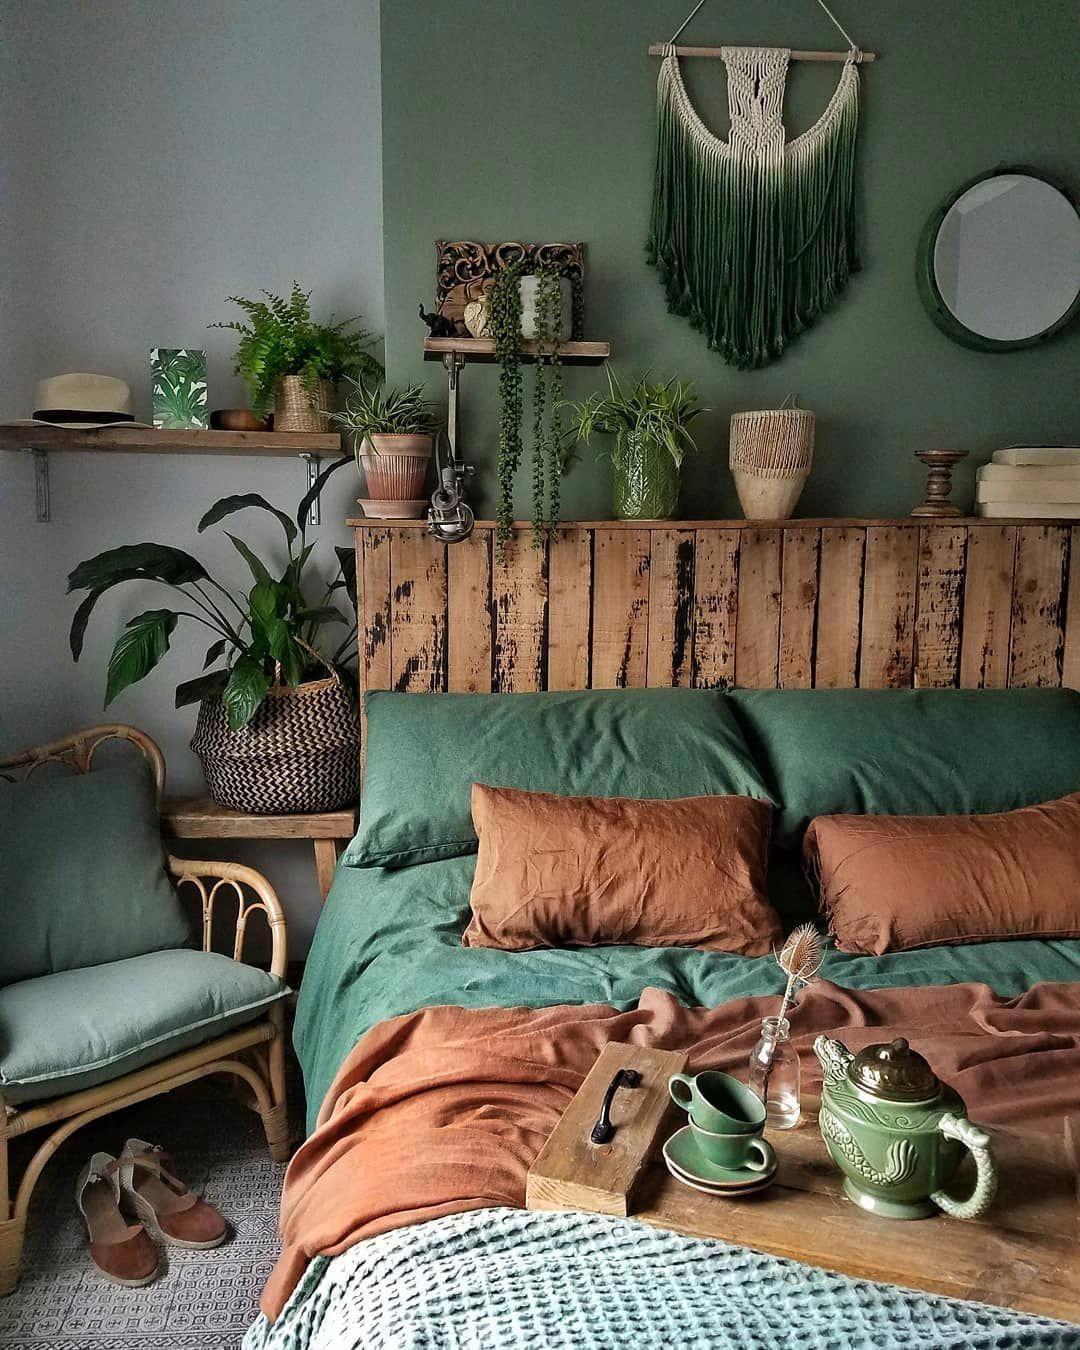 19 Inspiration Green Bedroom In 2019 Greenbedroom Dark Green Bedroom Green Bedroom Decor Green Curtai Green Bedroom Decor Bedroom Decor Design Bedroom Green